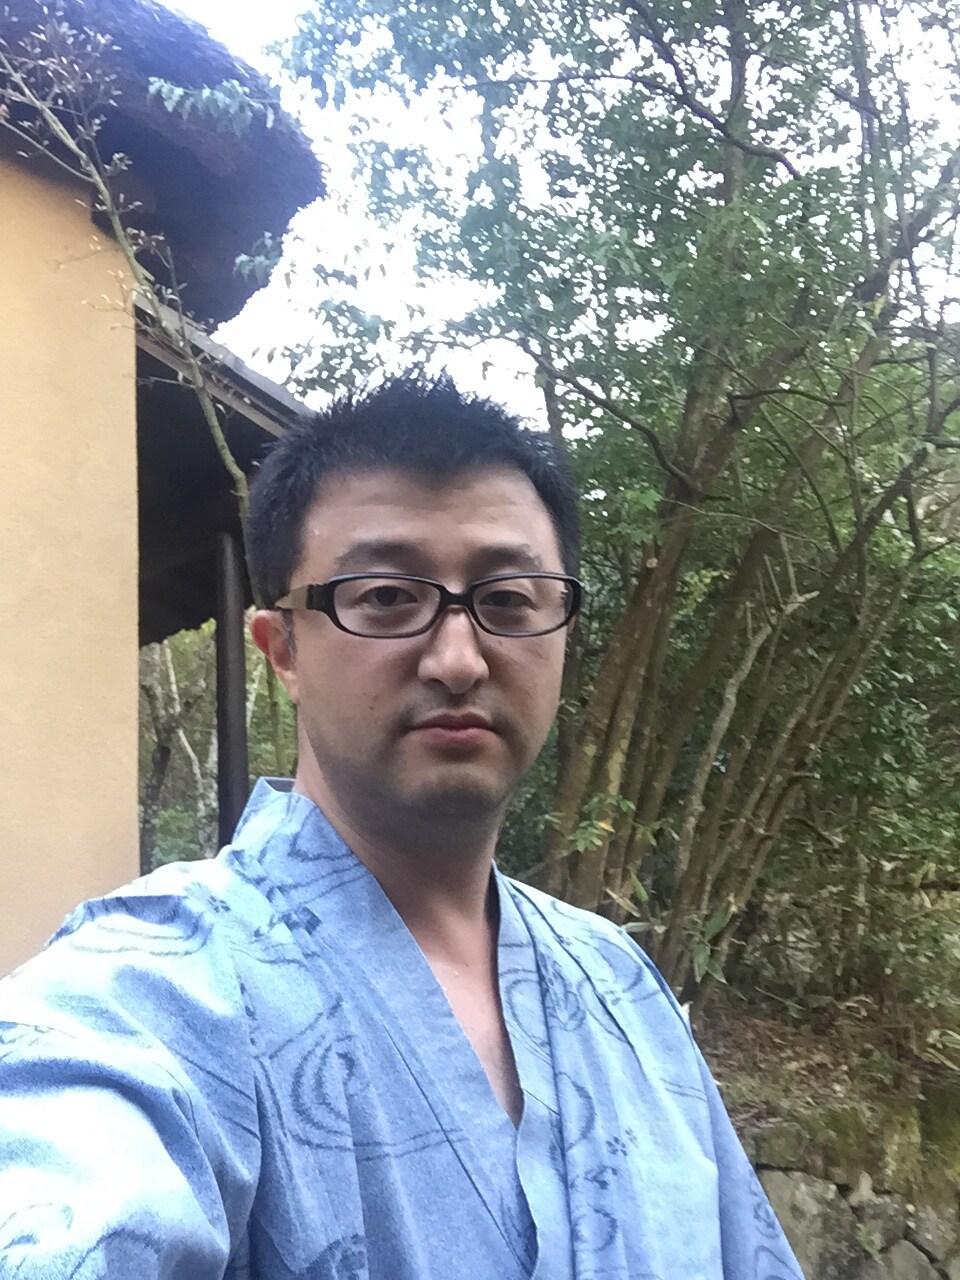 Mitsuru From Sumida, Japan